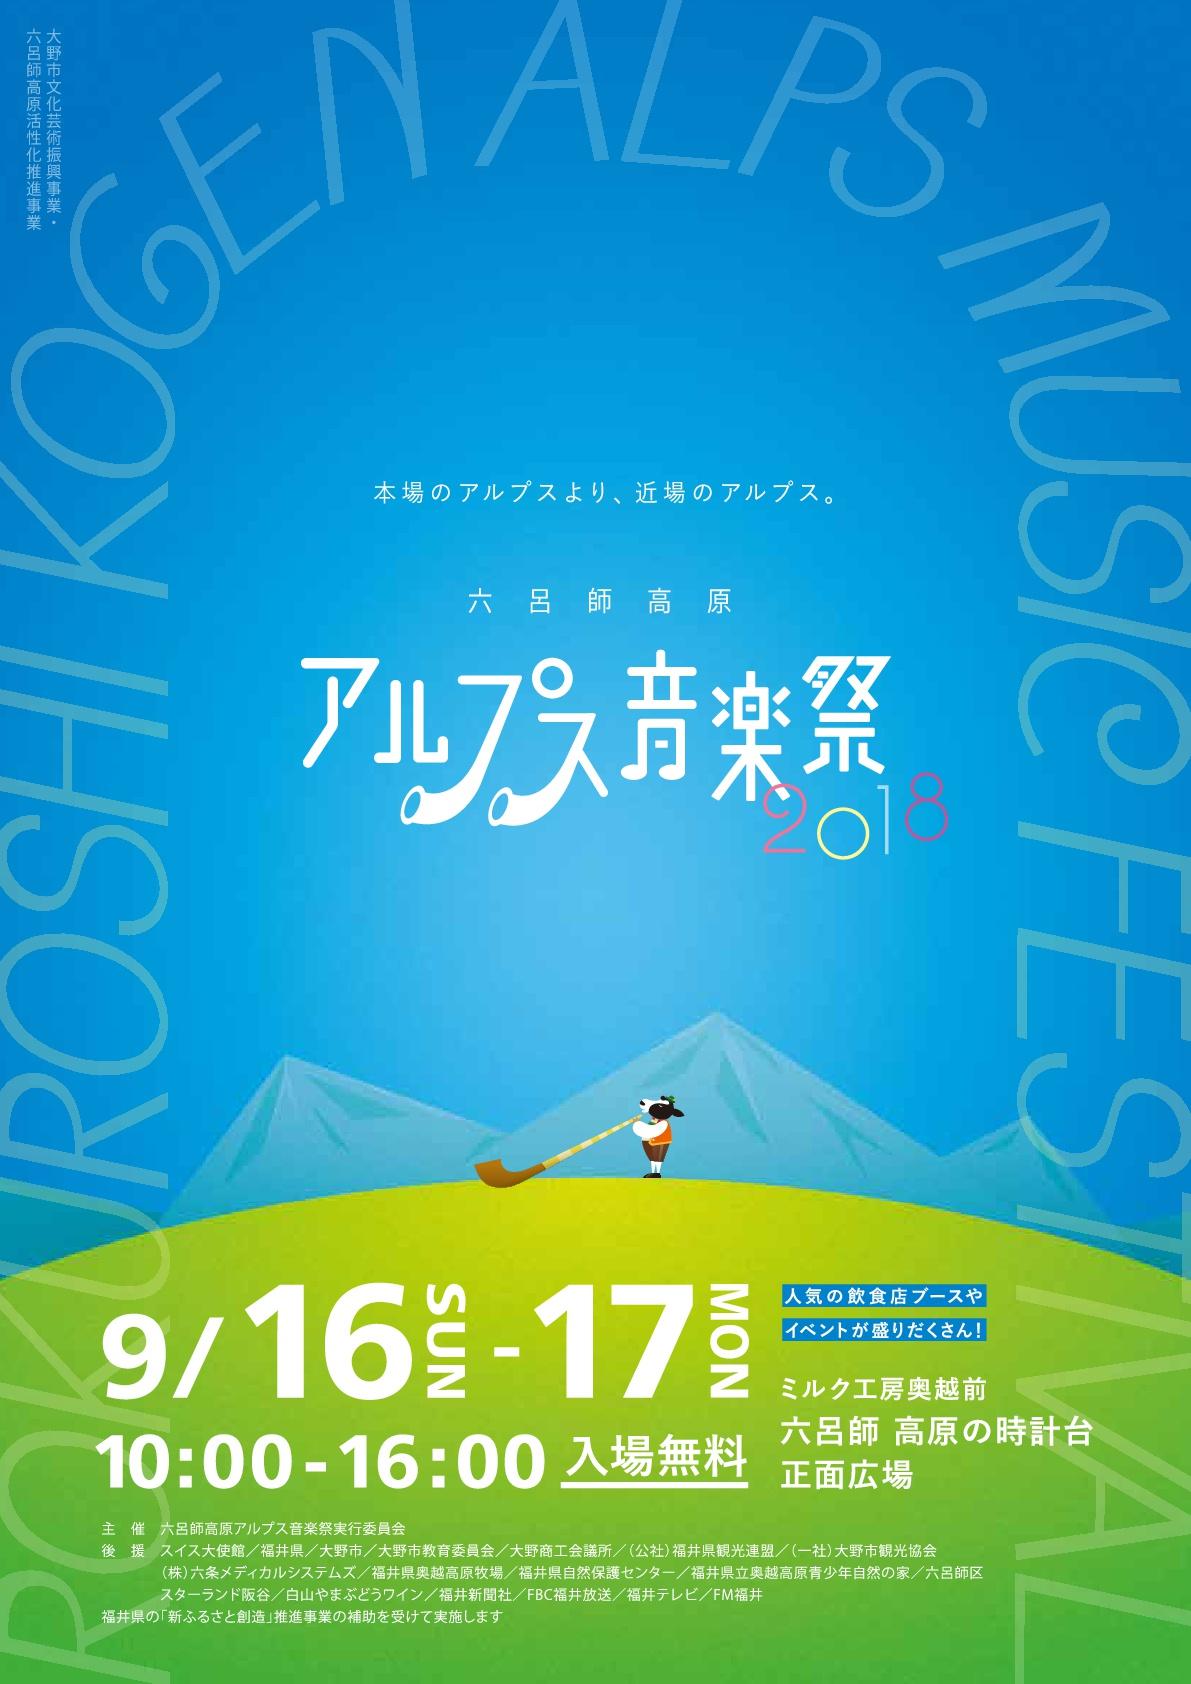 2018 六呂師高原アルプス音楽祭(大野市)